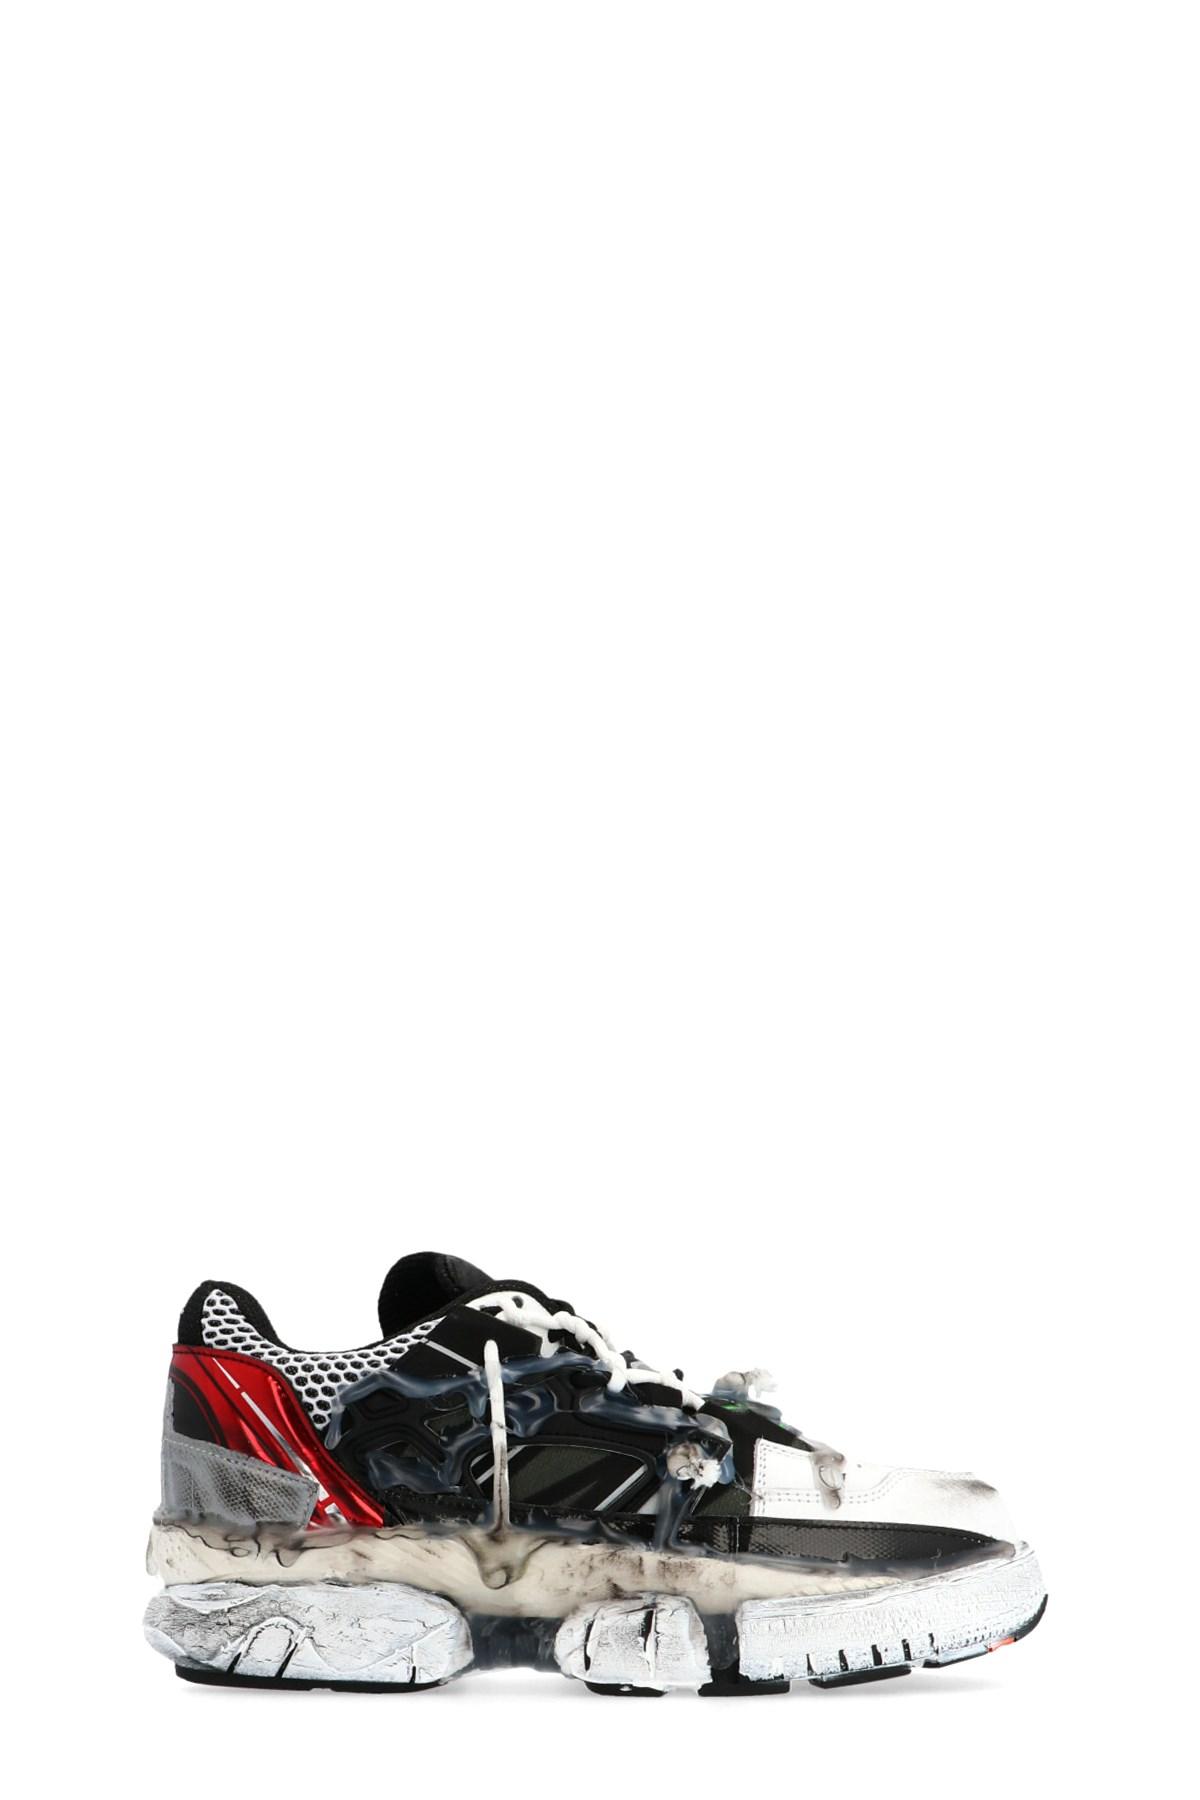 margiela fusion shoes